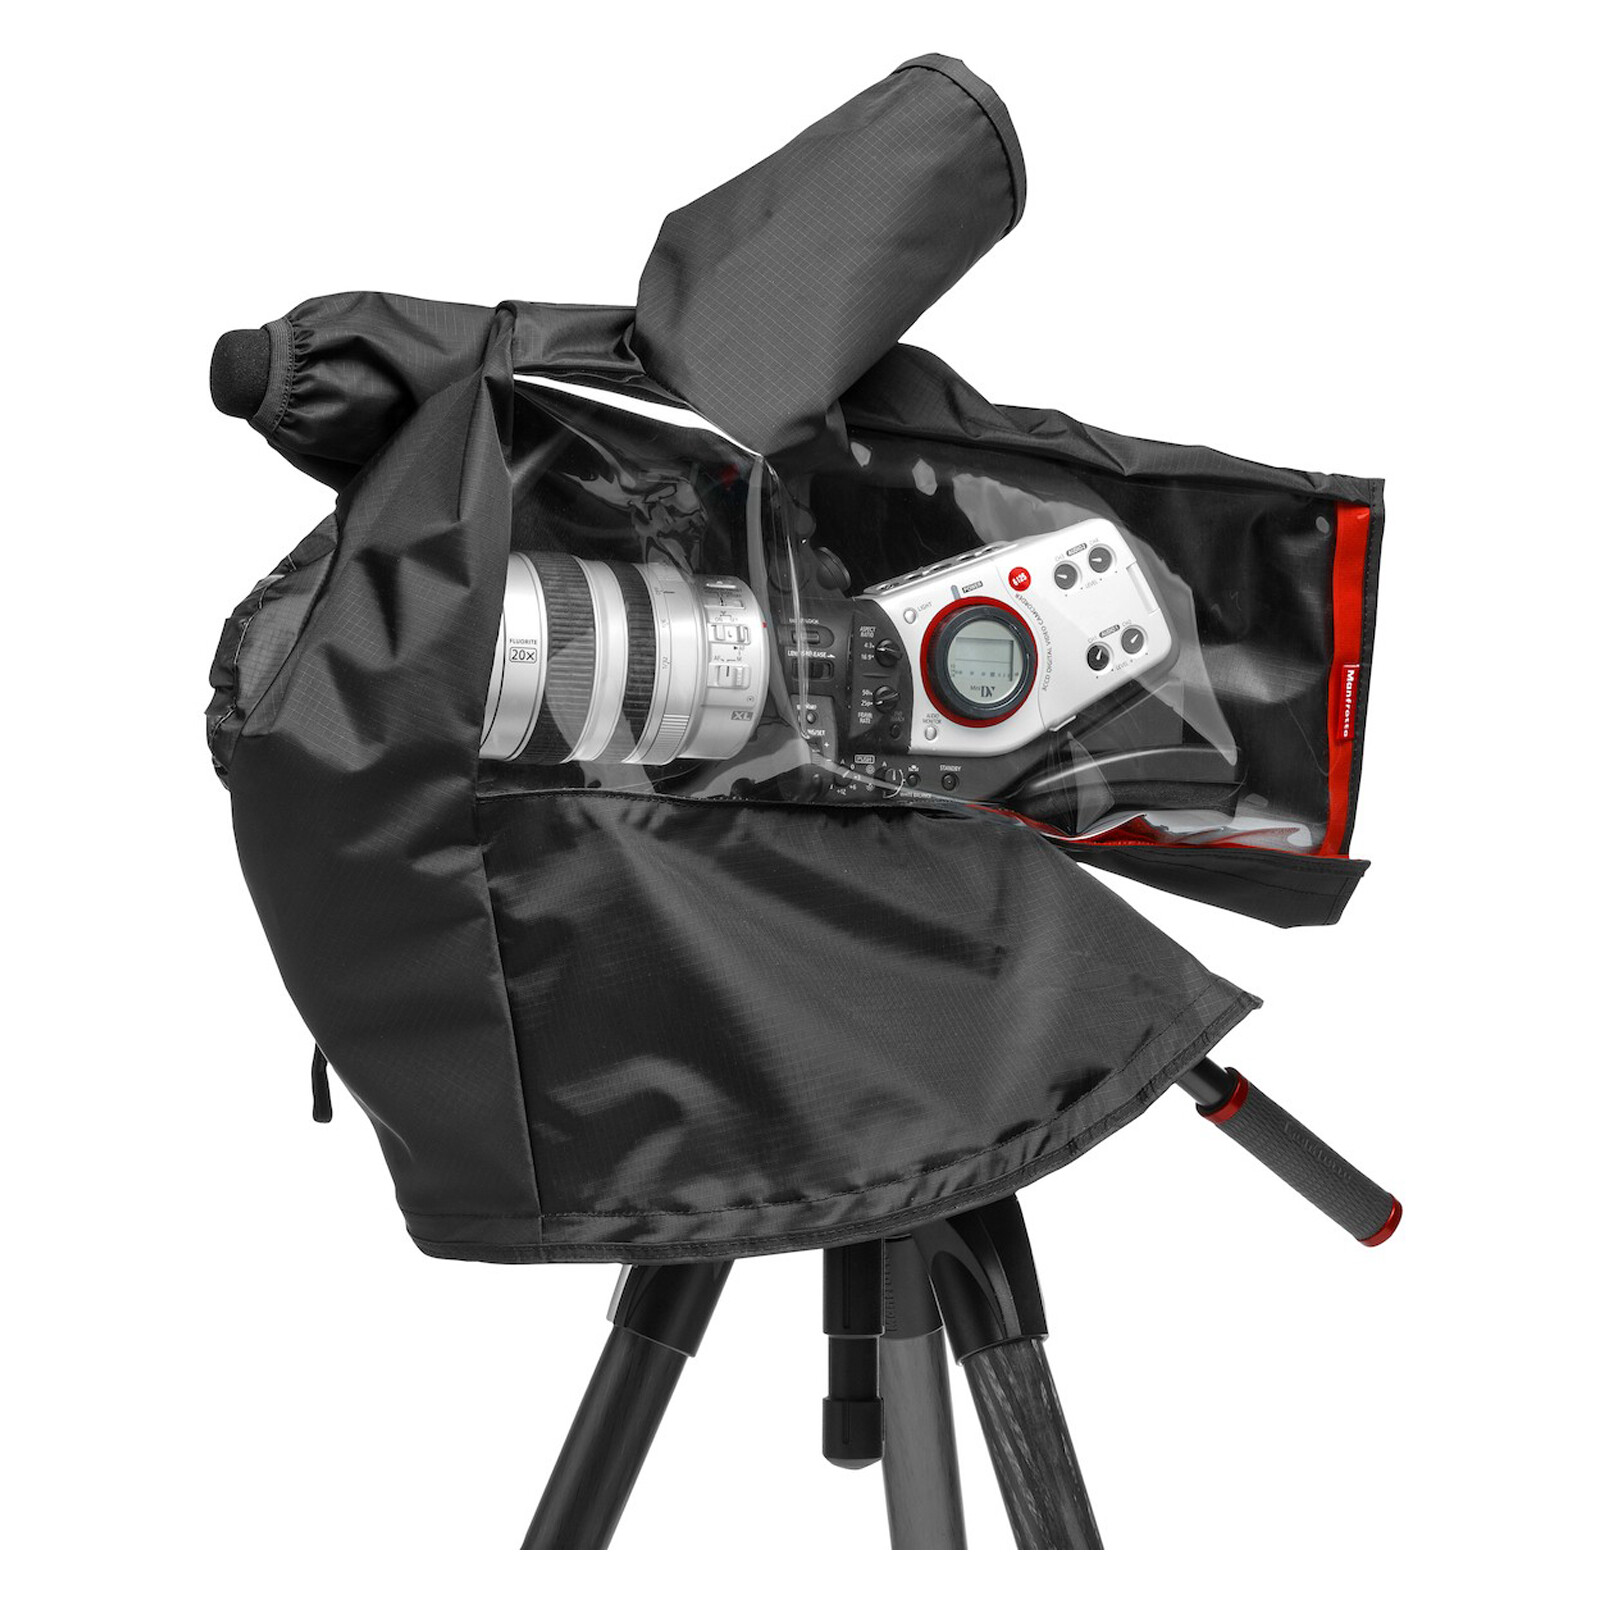 Manfrotto RC-12PL Pro Light Regenschutz